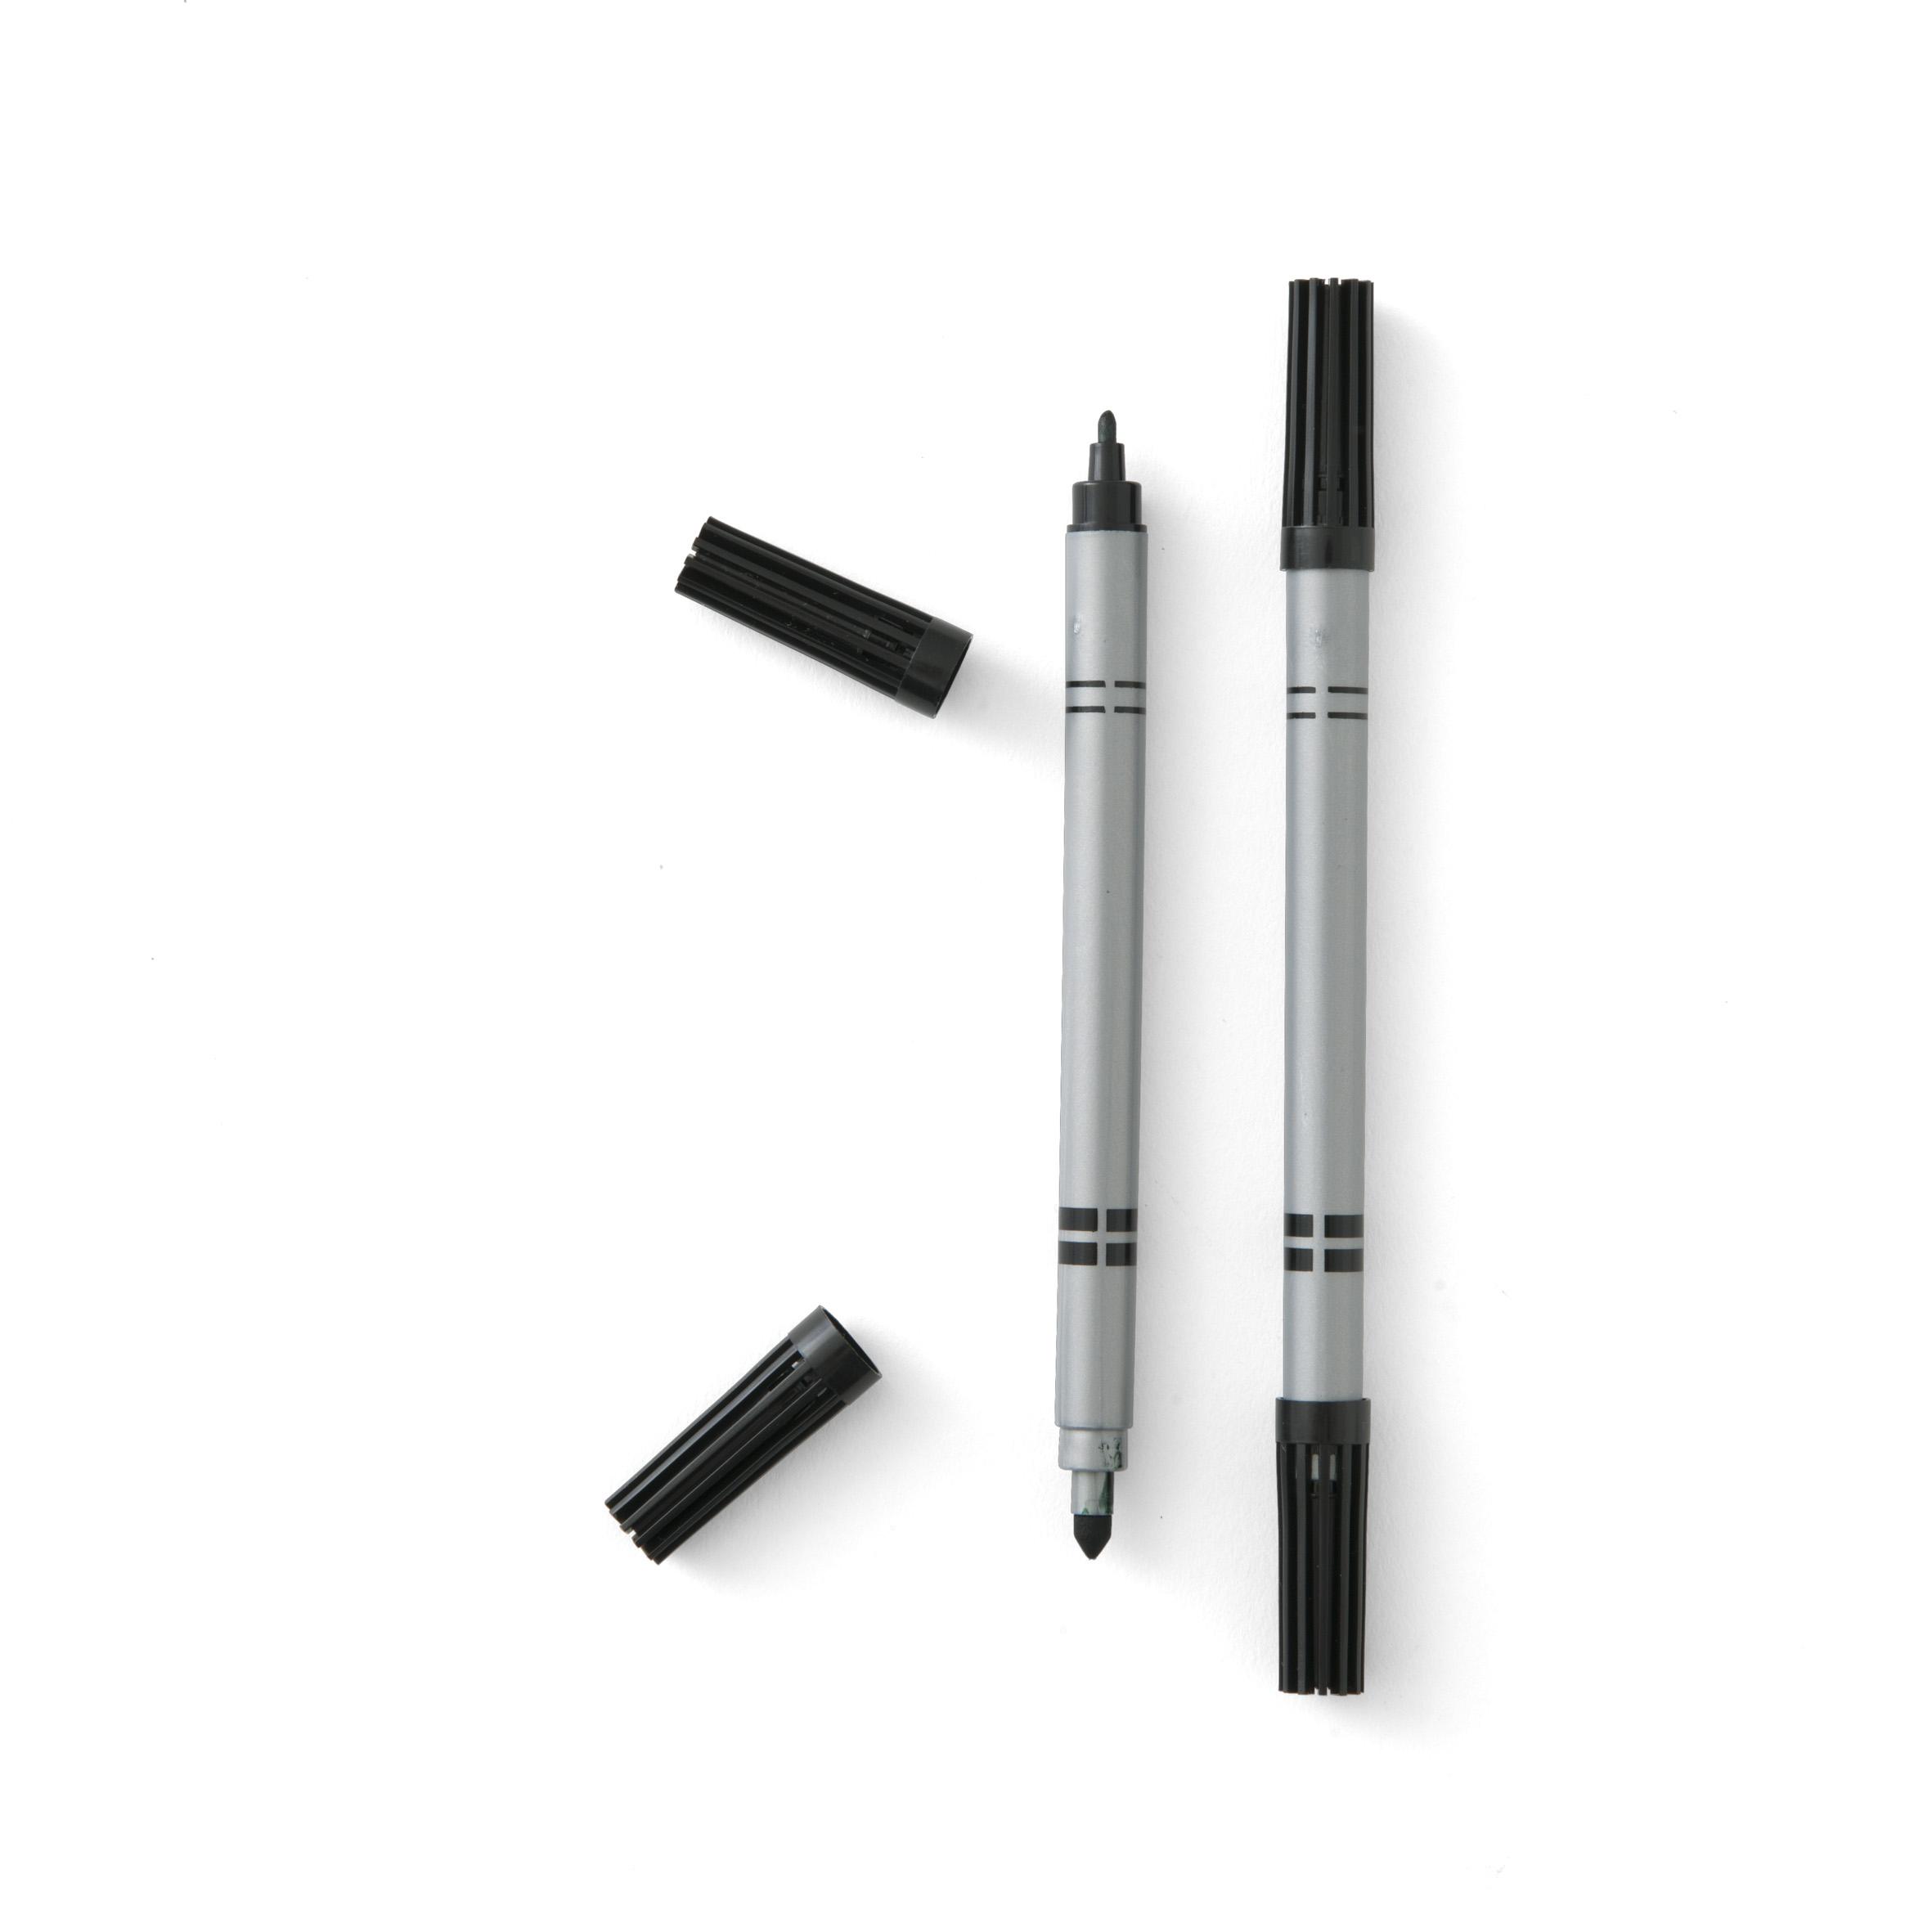 Black food grade pen